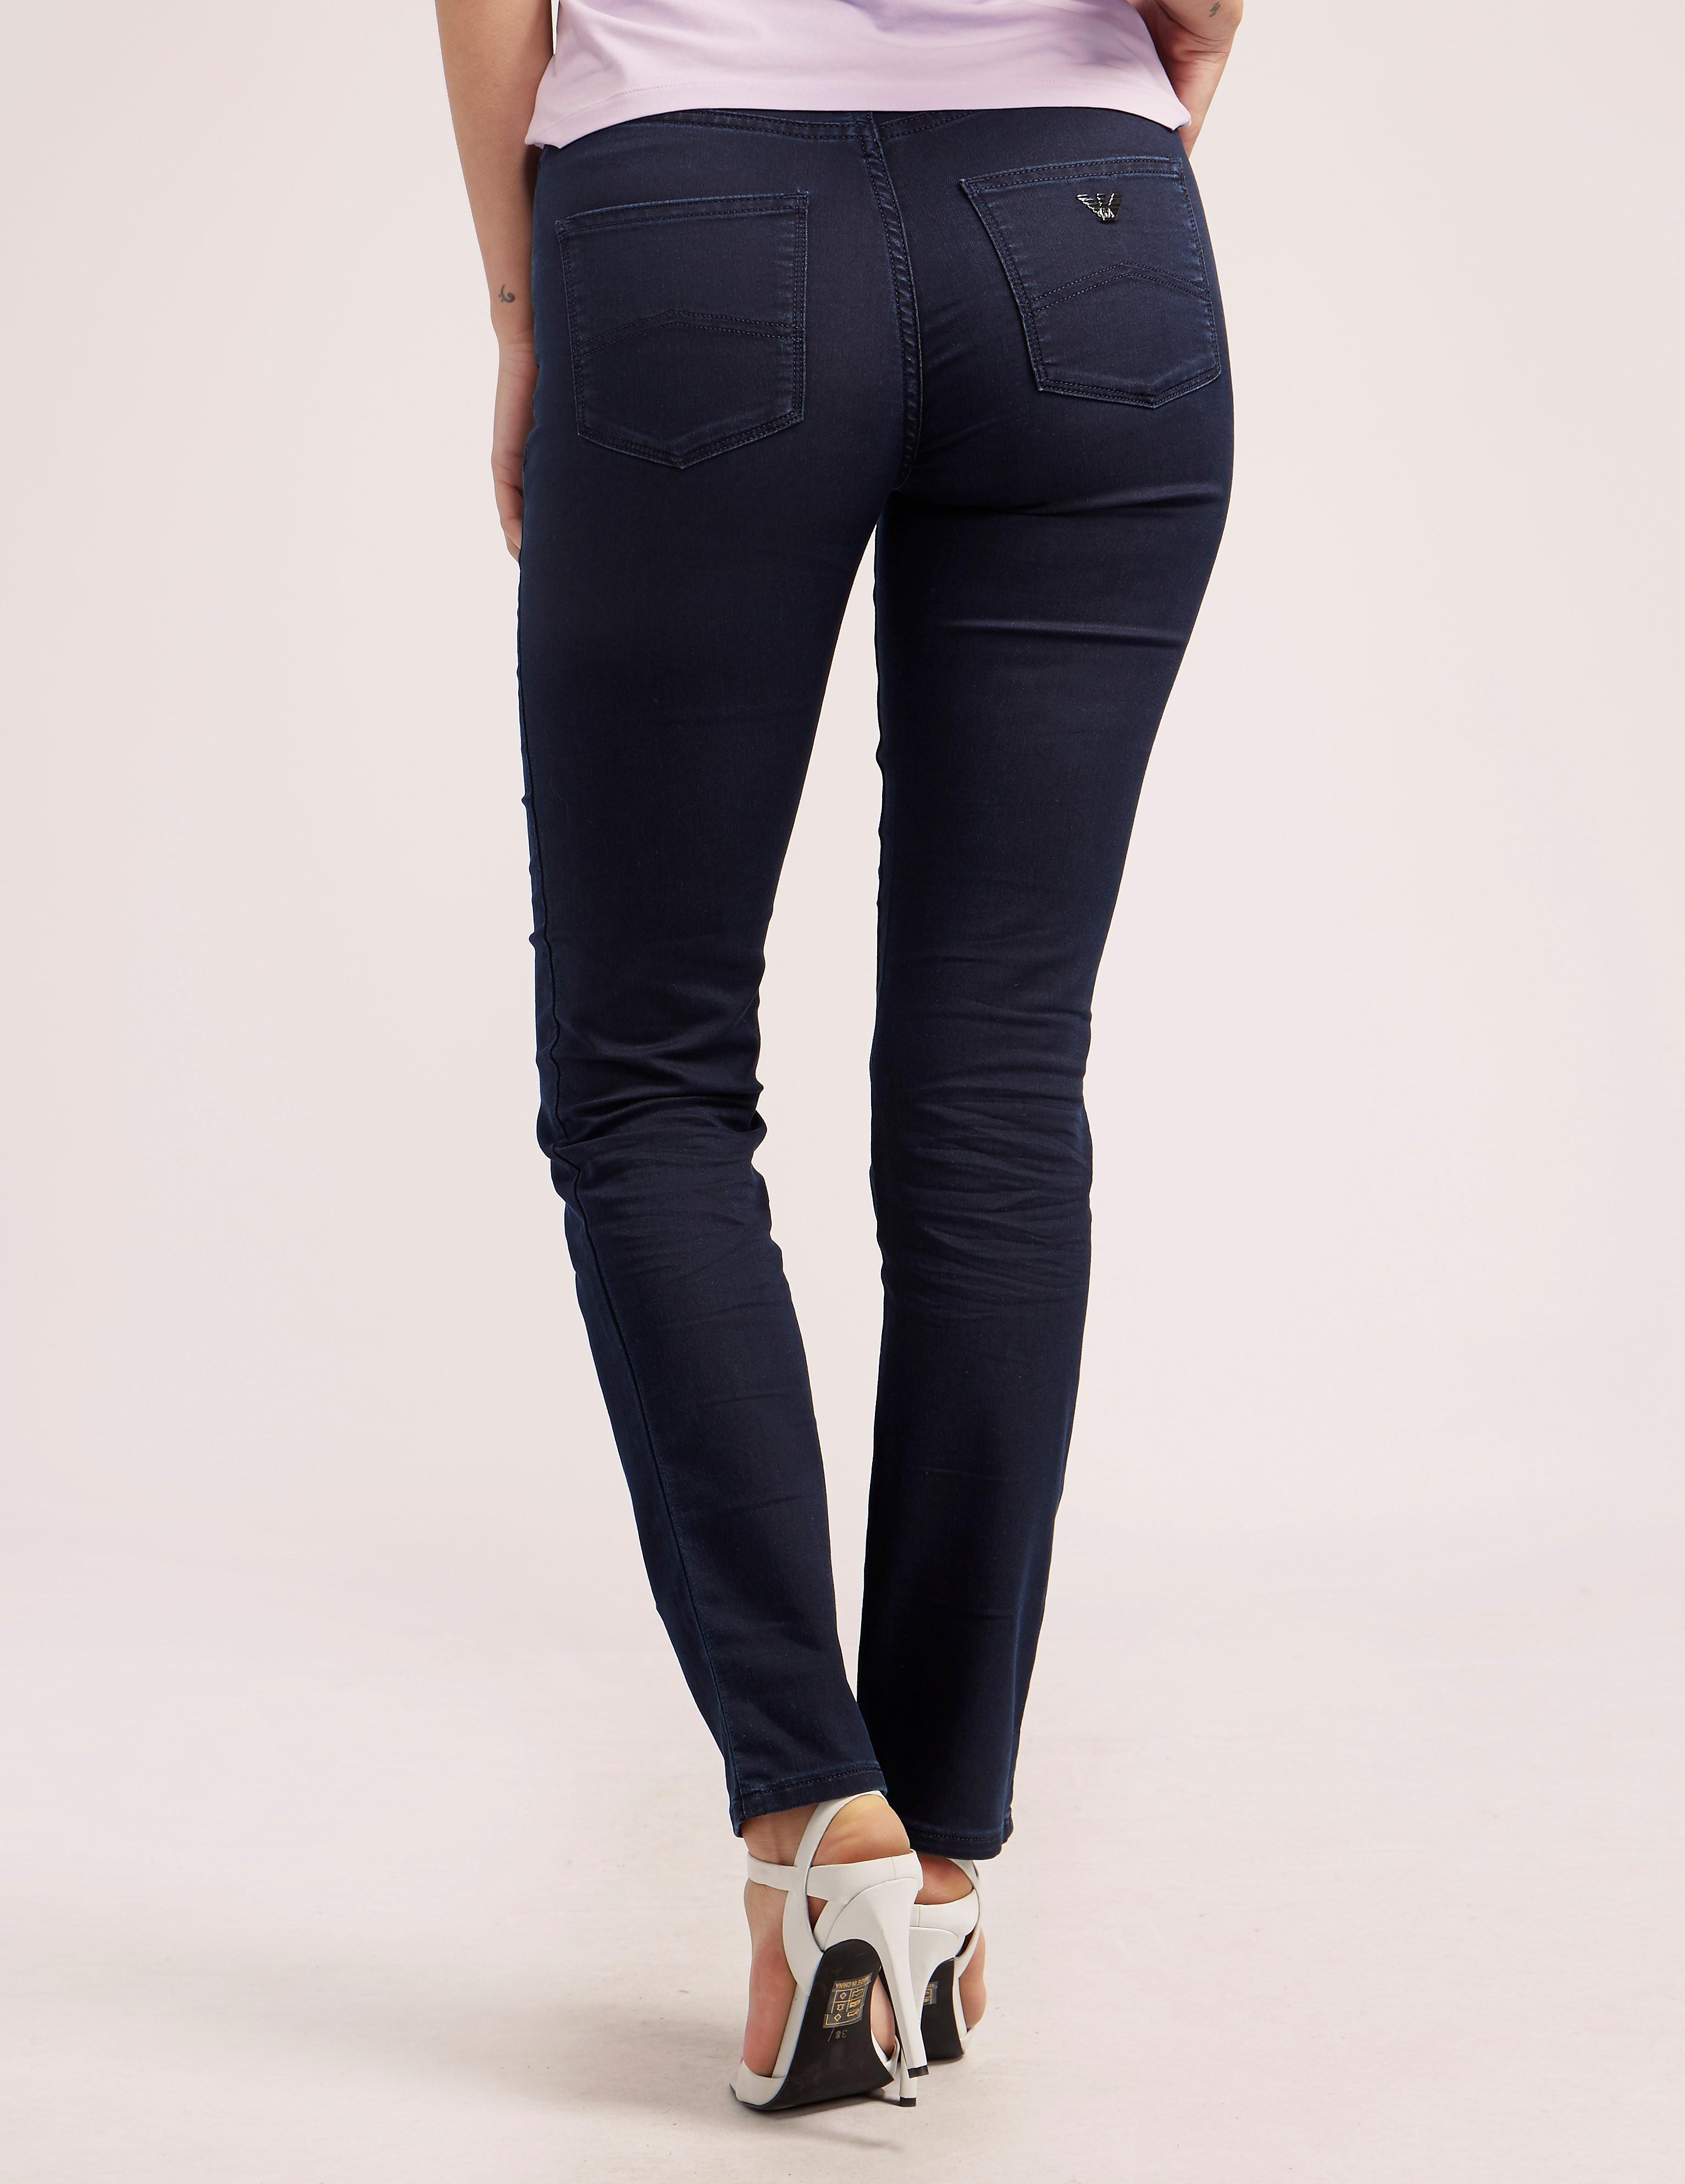 Armani Jeans J18 High Waist Jean